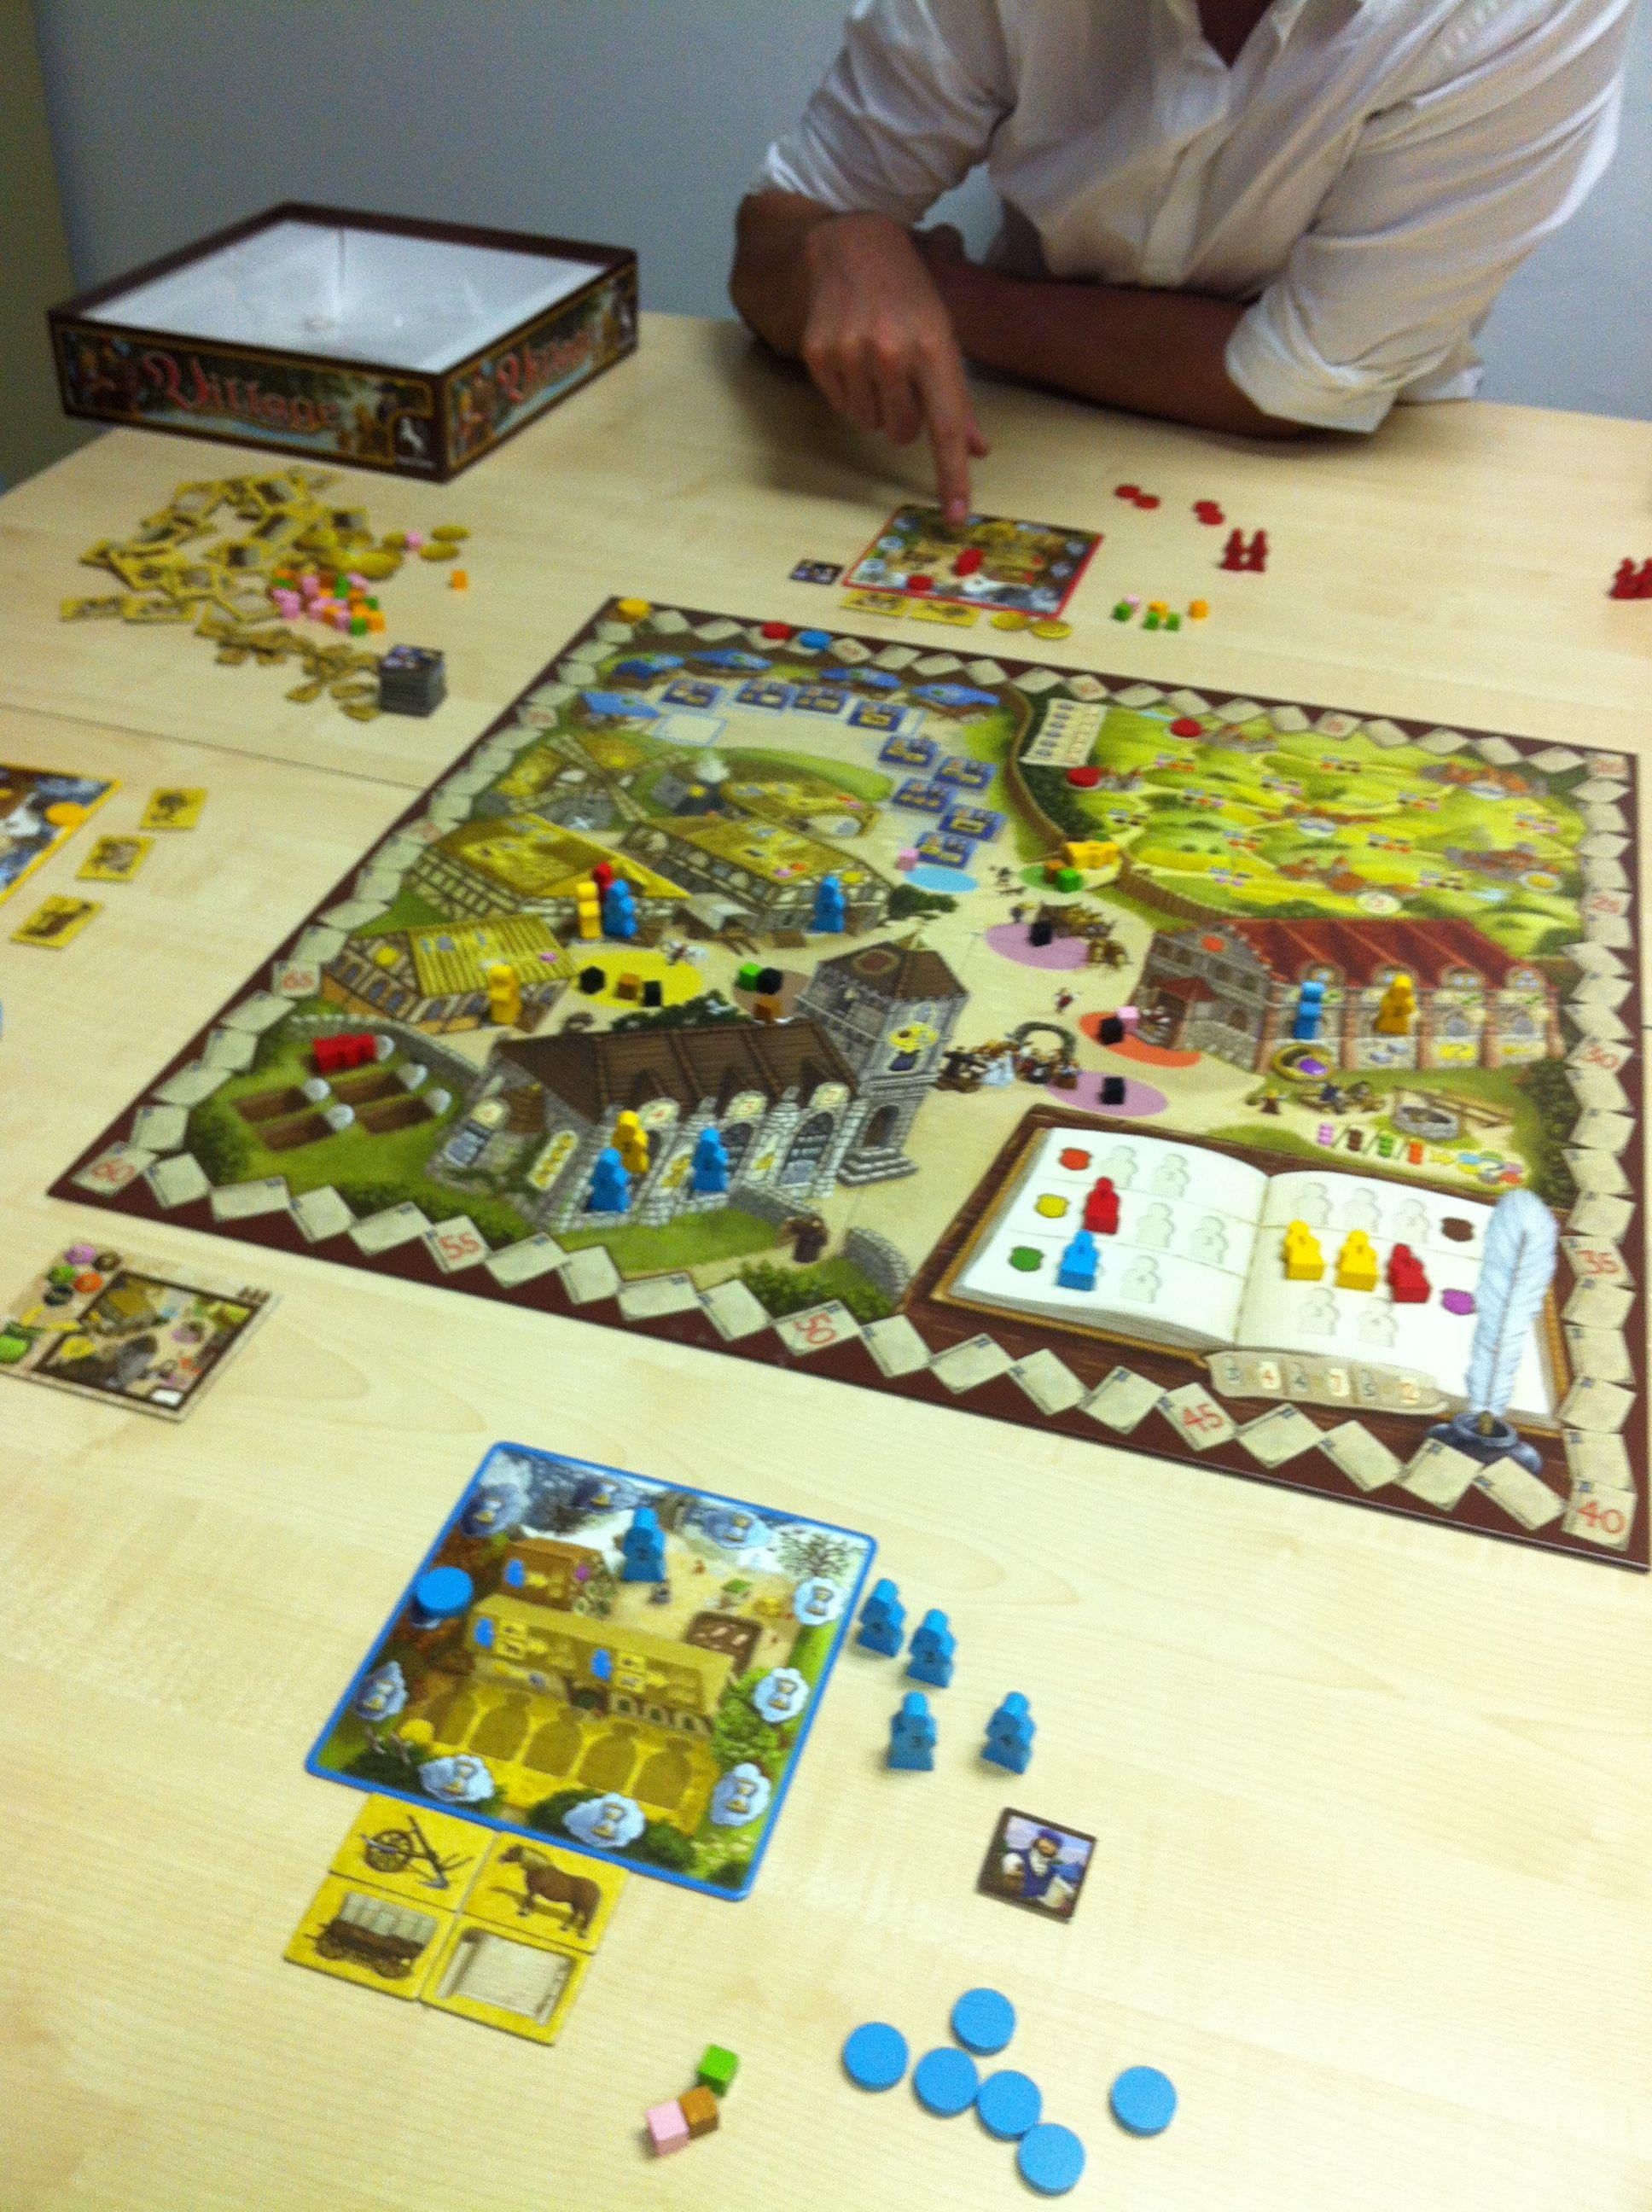 Great Game Of Village The Spiel Des Jahres Winner Games Board Games Play